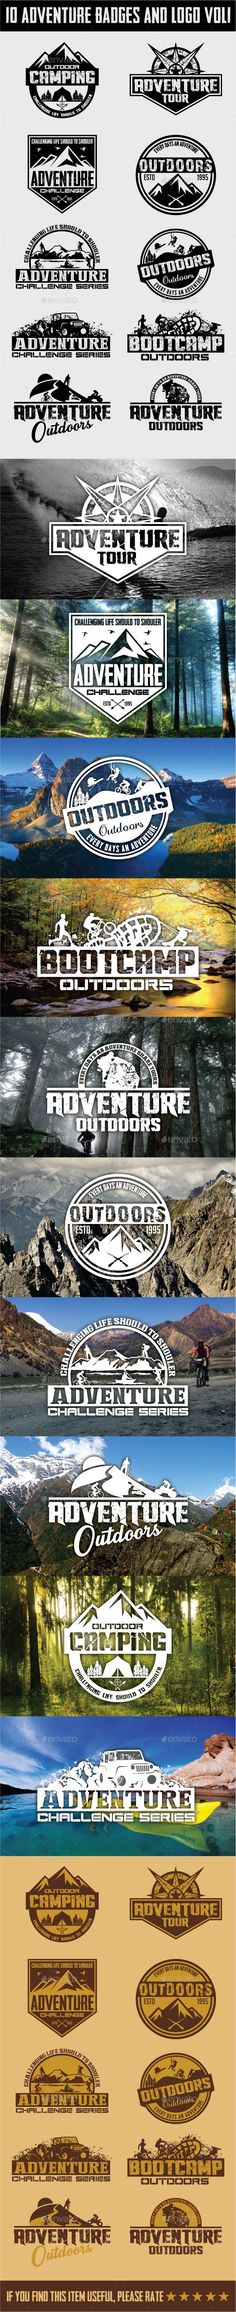 10 Adventure Badges and Logo Vol1 - Badges & Stickers Web Elements